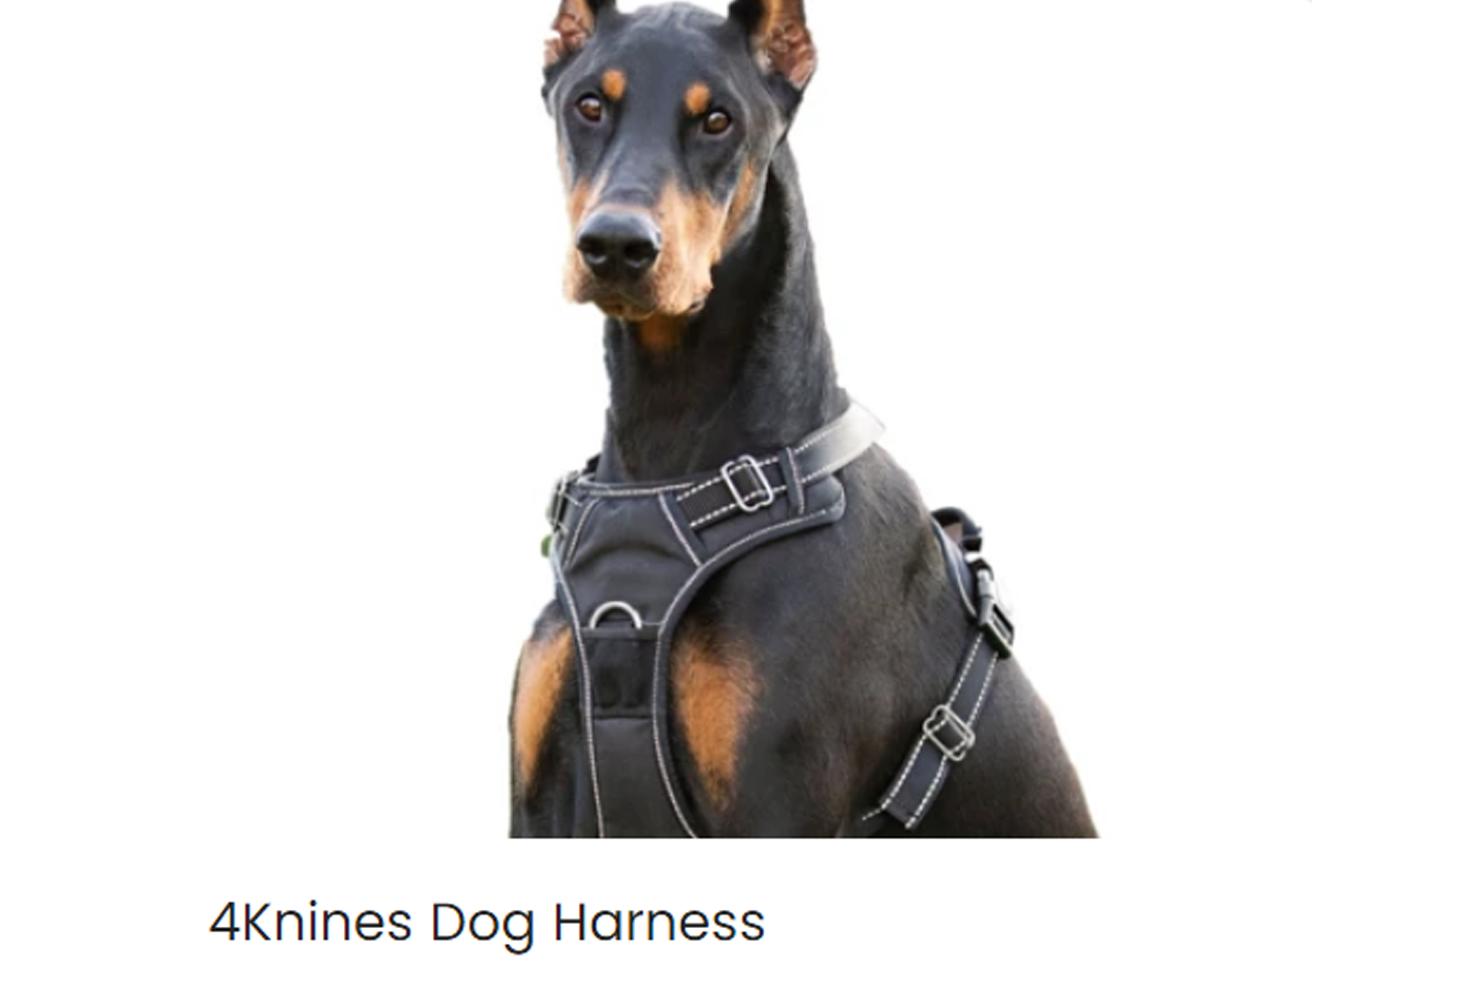 4Knines Dog Harness